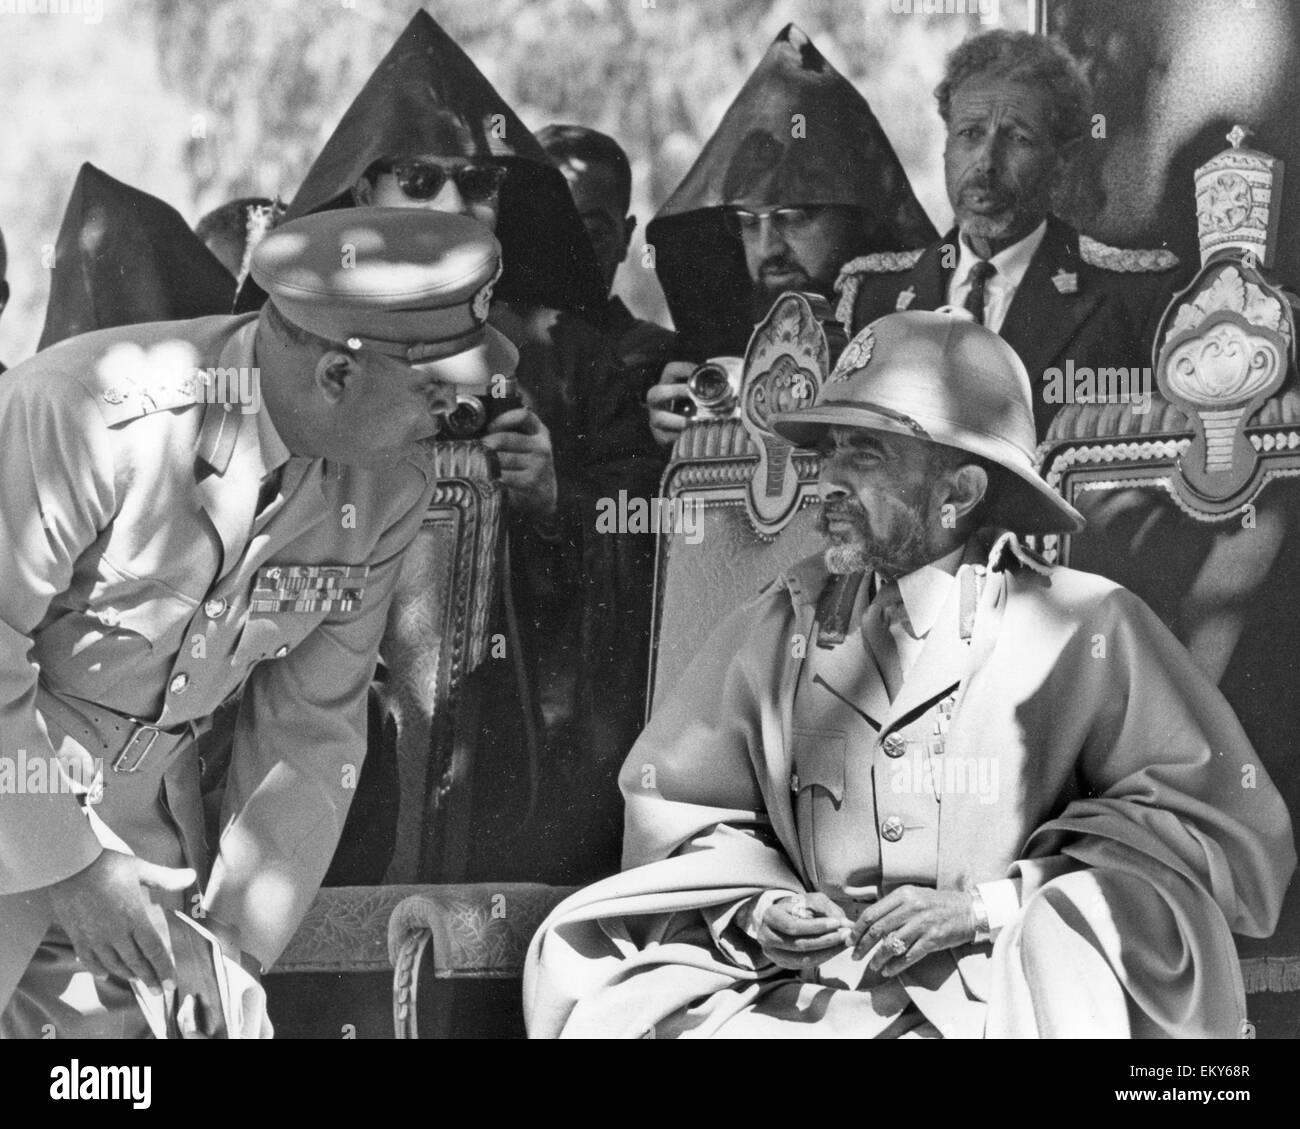 HAILE SELASSIE (1892-1975) Etheopian Regent about 1962 - Stock Image